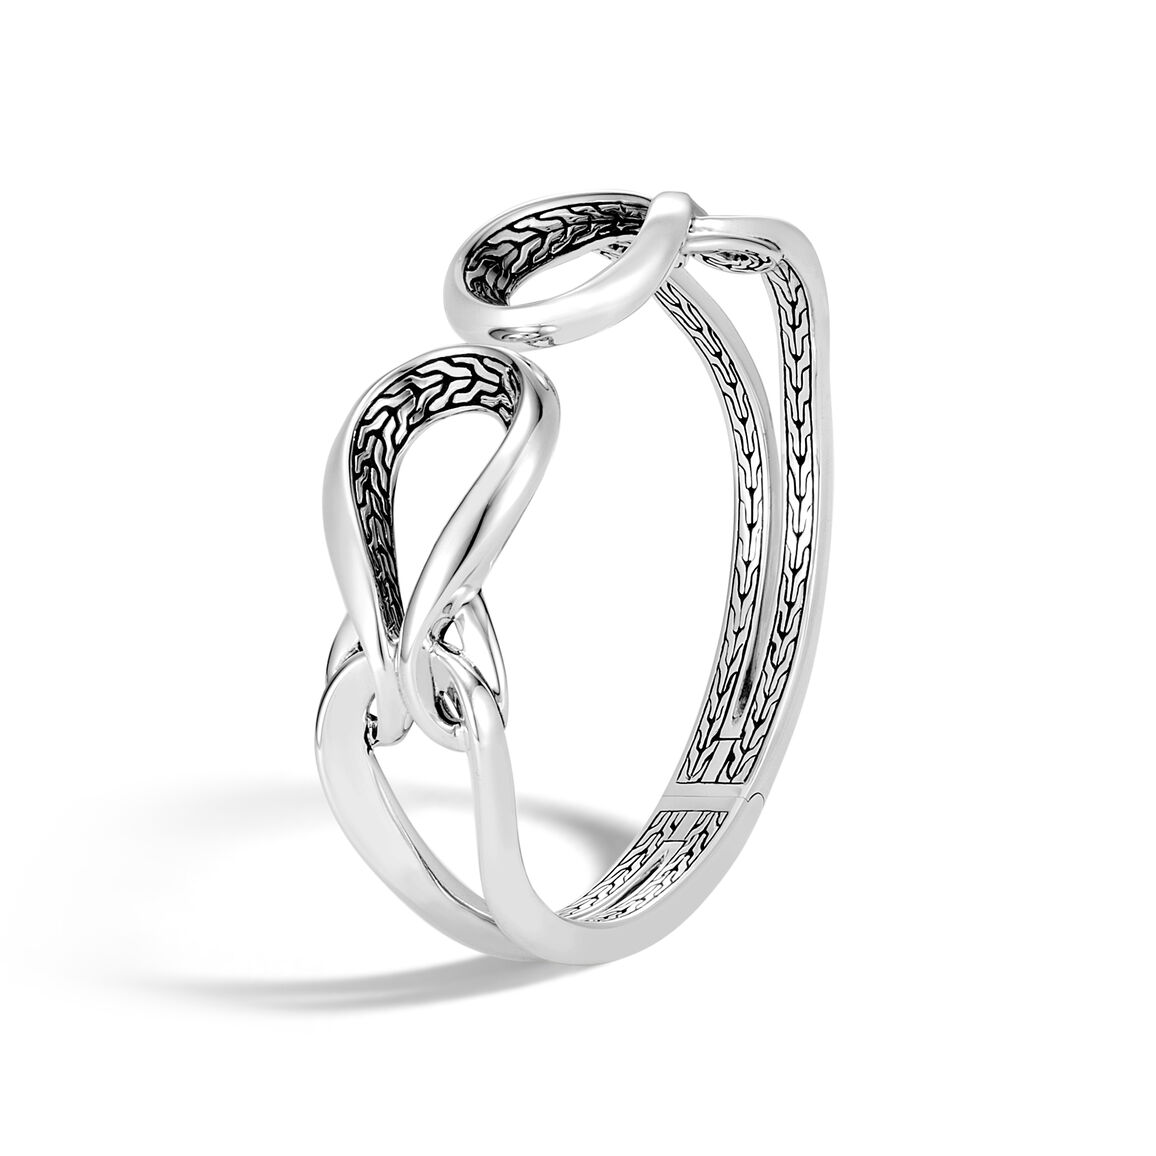 Asli Classic Chain Link Hinged Cuff in Silver